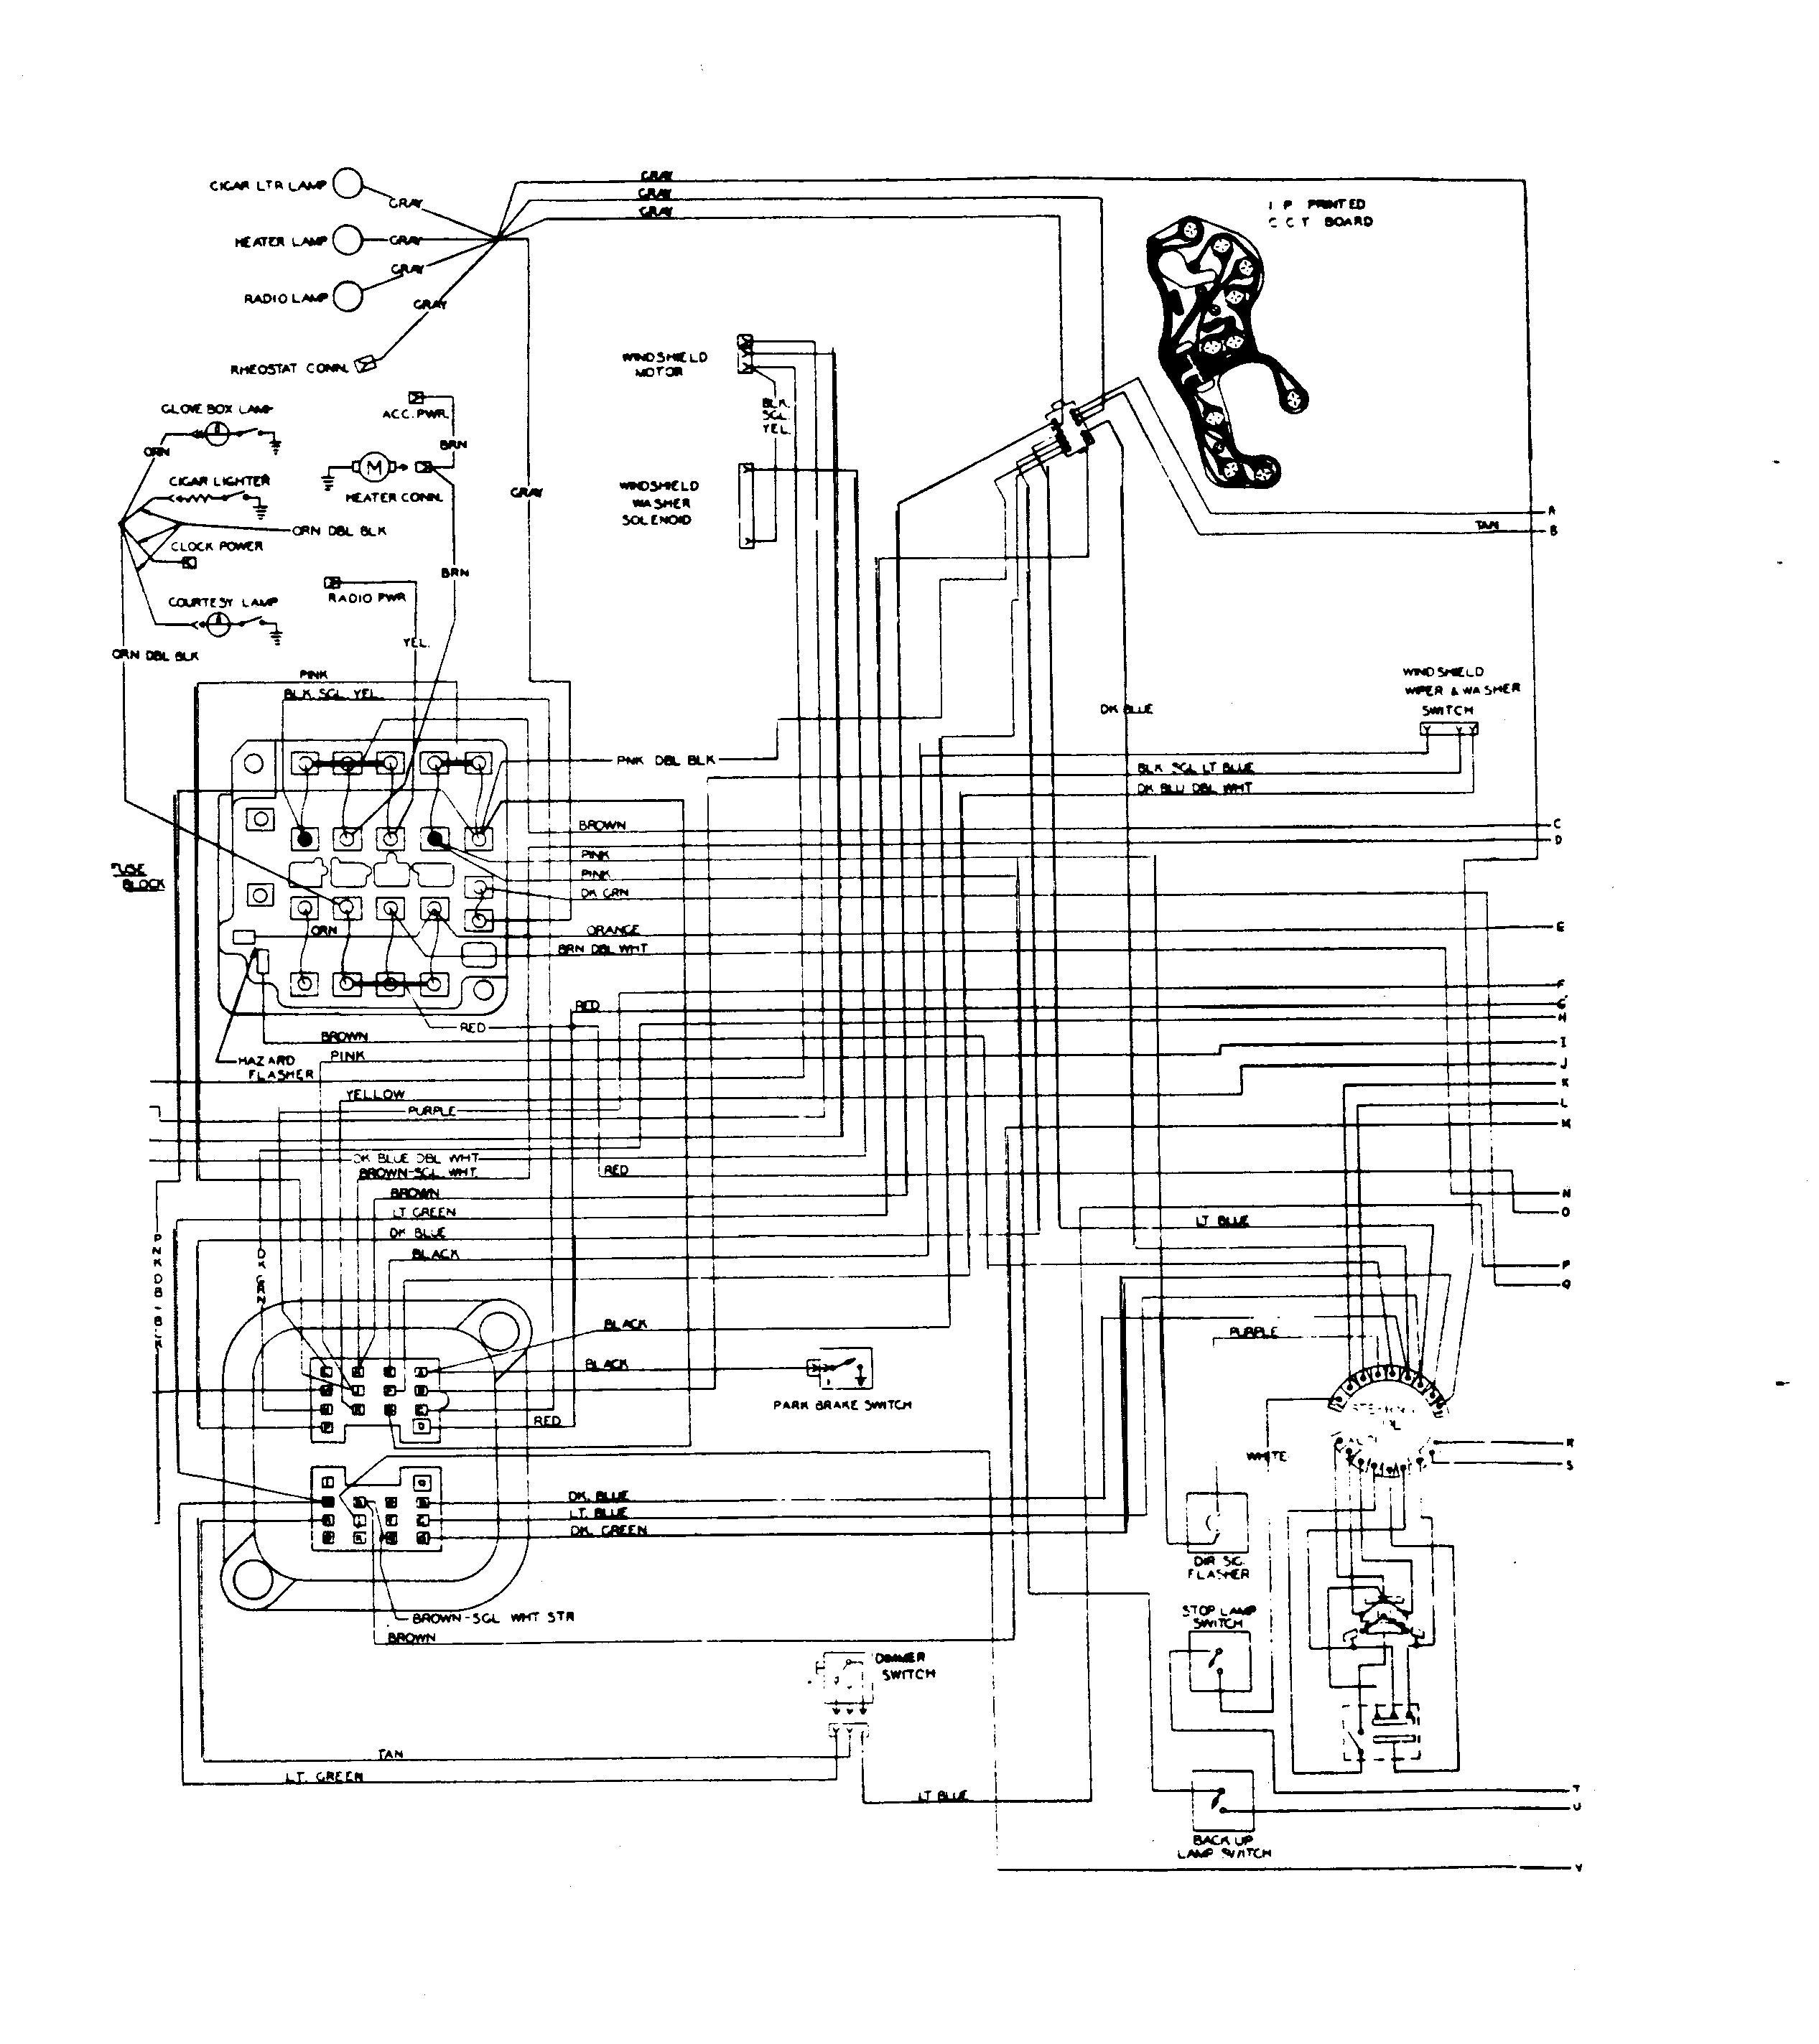 Tach Wire Diagram Autometer Tachometer Wiring Amc Javelin Diagrams Gto Auto Schematic Pontiac Home